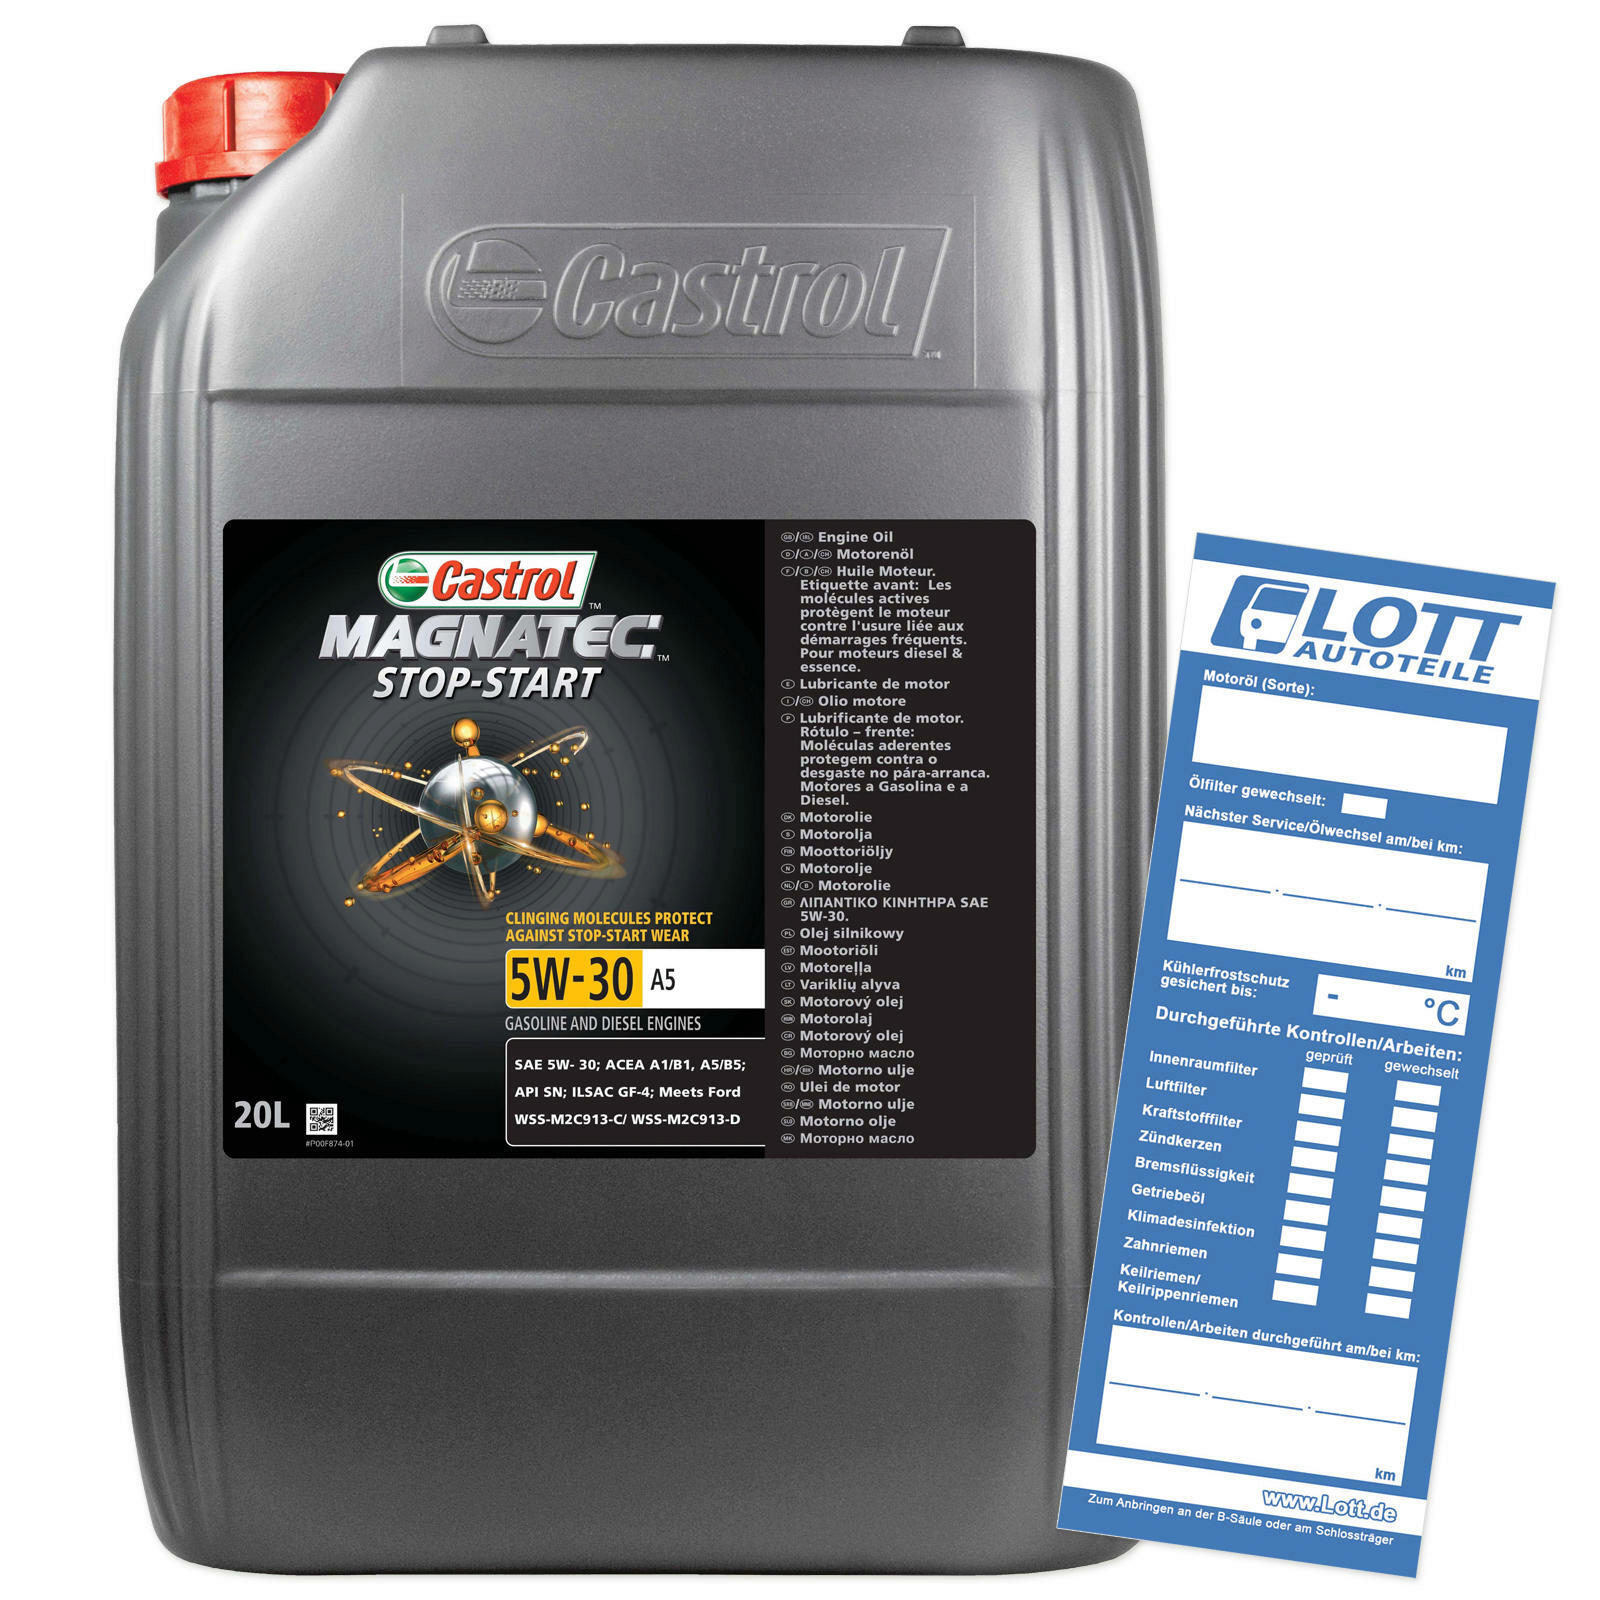 CASTROL Motoröl MAGNATEC STOP-START 5W-30 A5